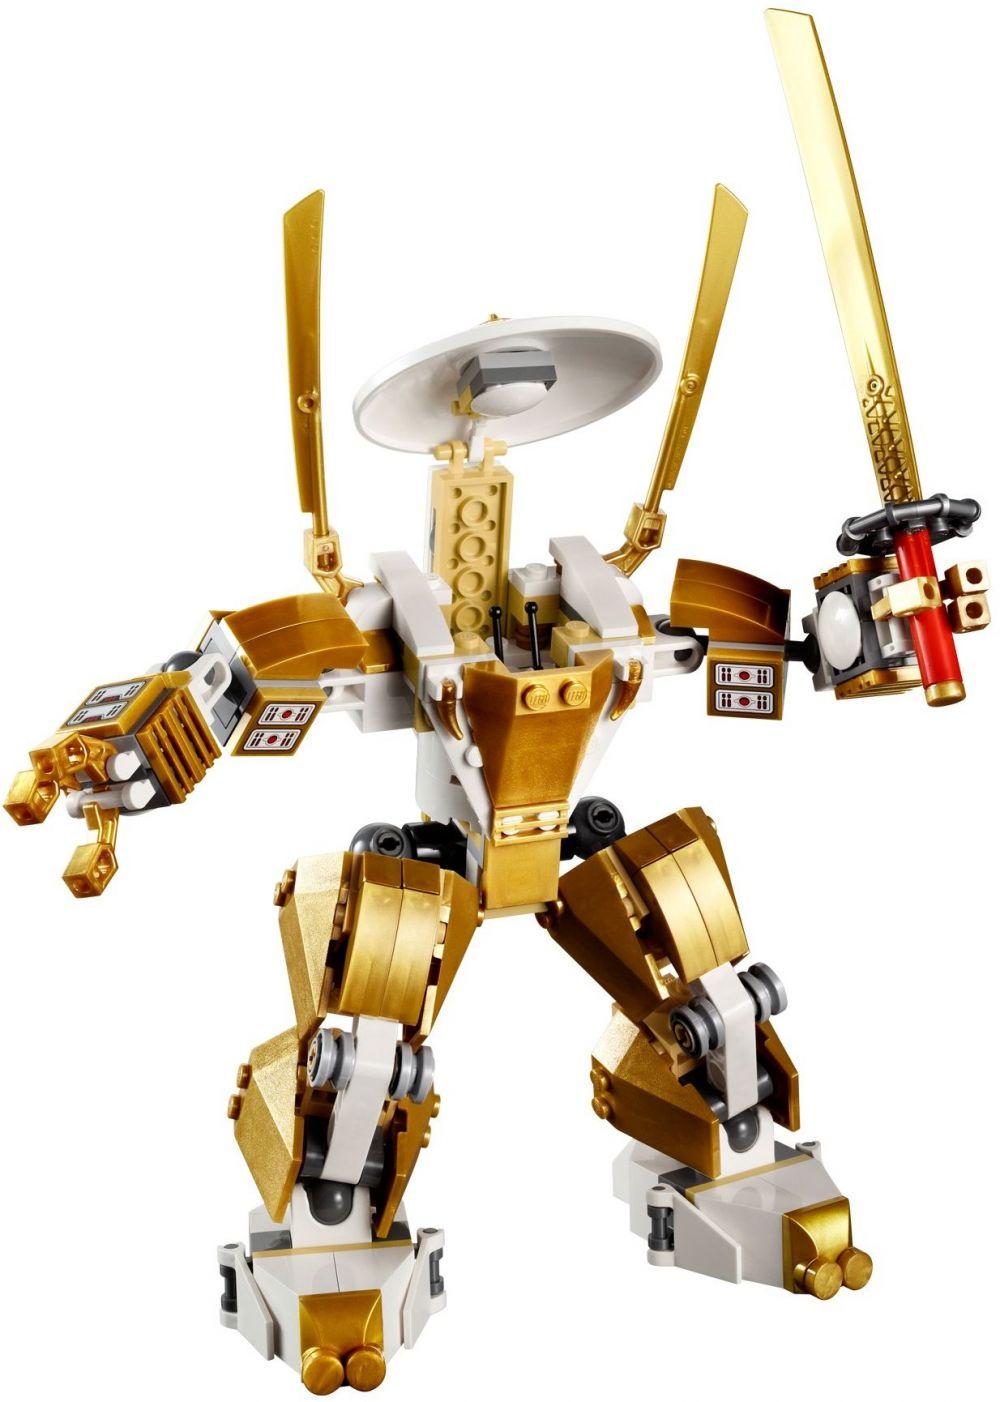 Lego ninjago 70505 pas cher le temple de la lumi re - Lego ninjago d or ...